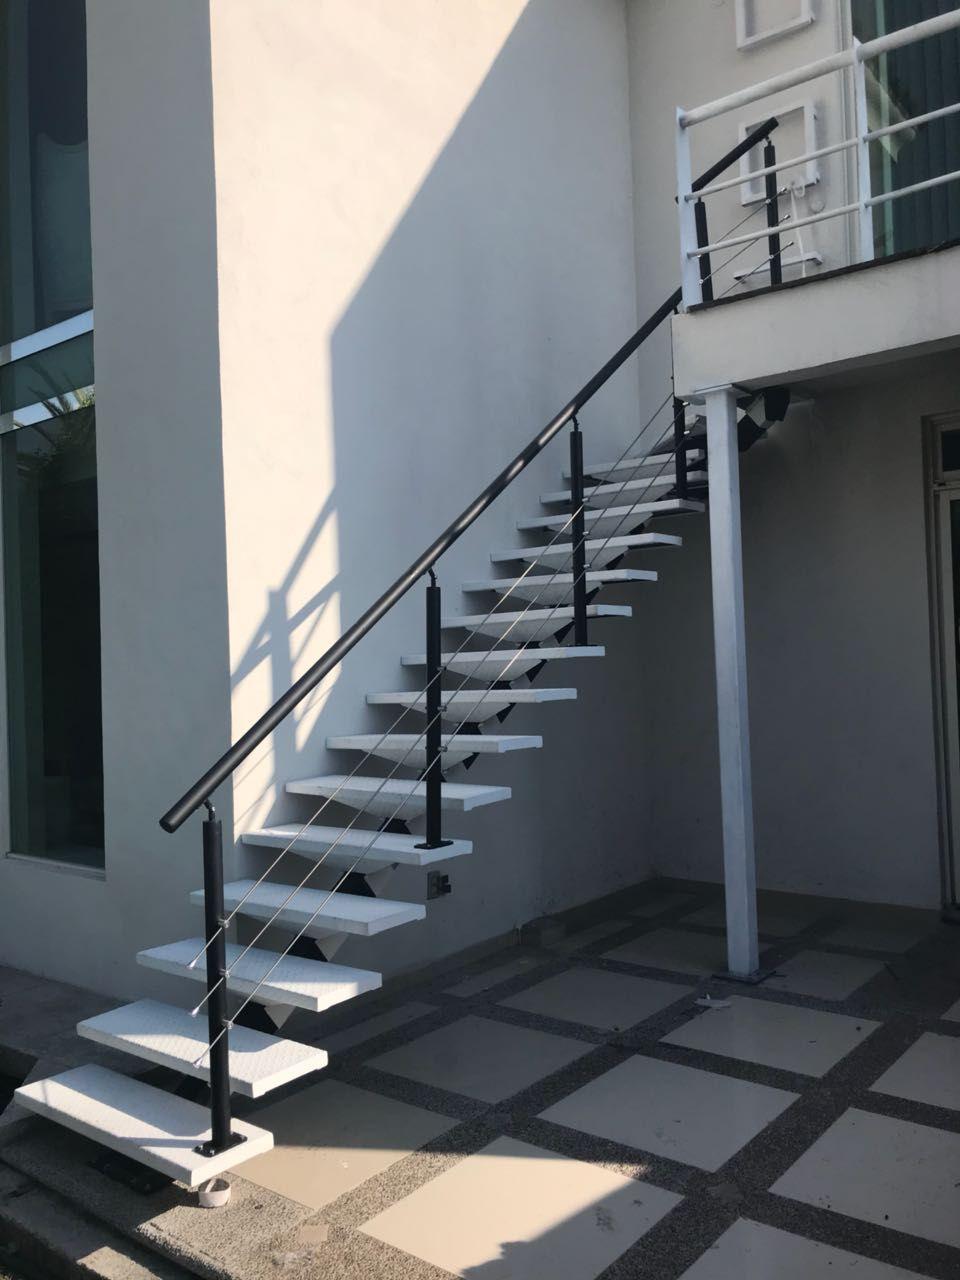 Escalera modelo bonampak con barandal especial met lica for Escalera metalica para exteriores